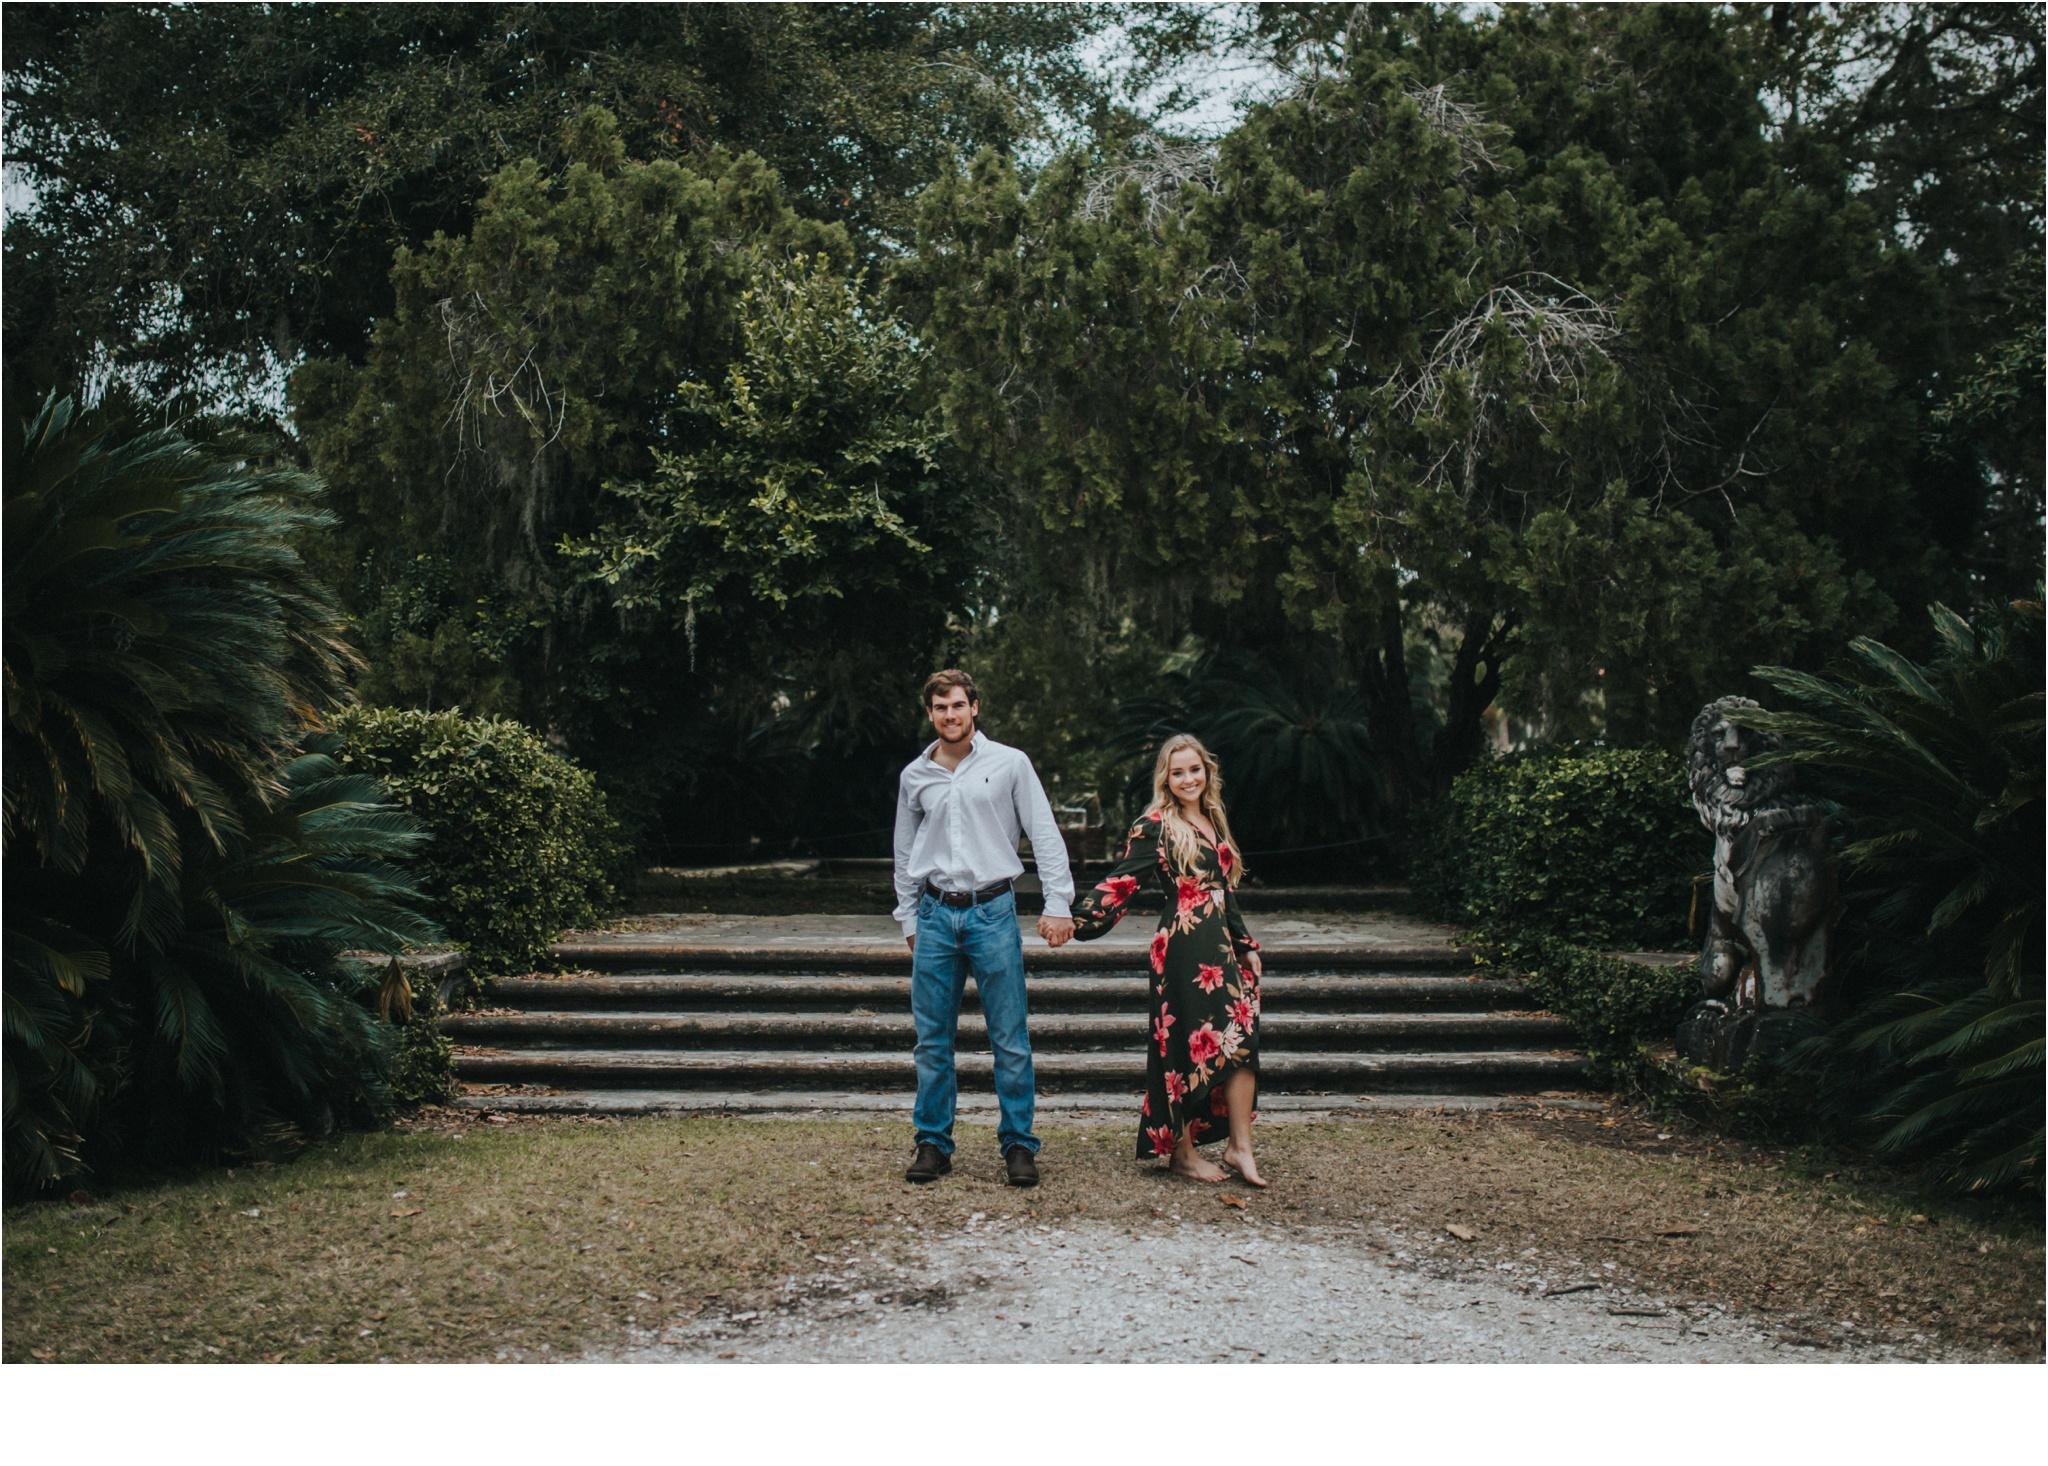 Rainey_Gregg_Photography_St._Simons_Island_Georgia_California_Wedding_Portrait_Photography_0706.jpg